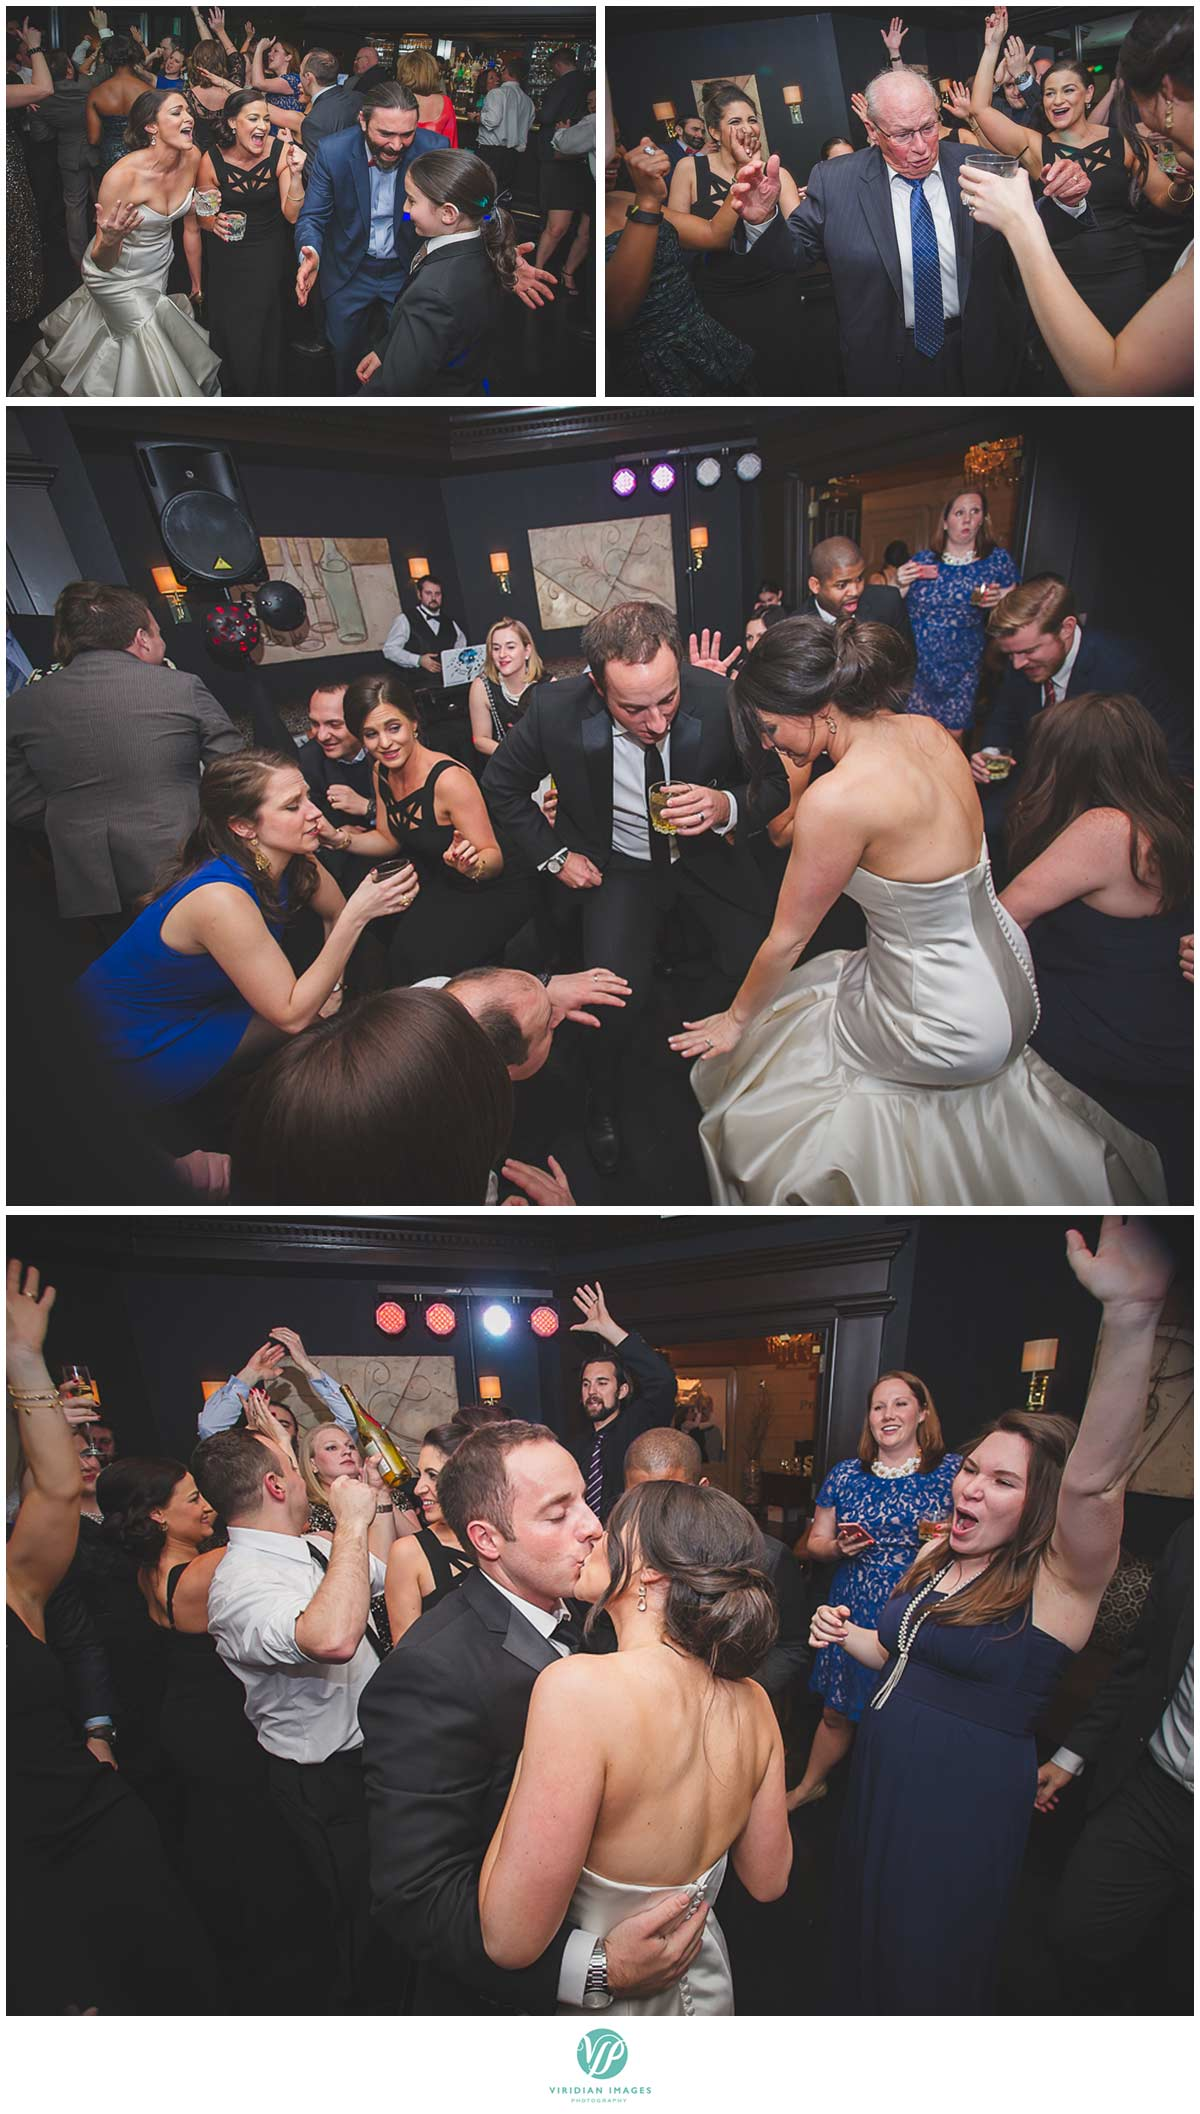 Peachtree_Club_Atlanta_Wedding_Viridian_Images_Photography-38